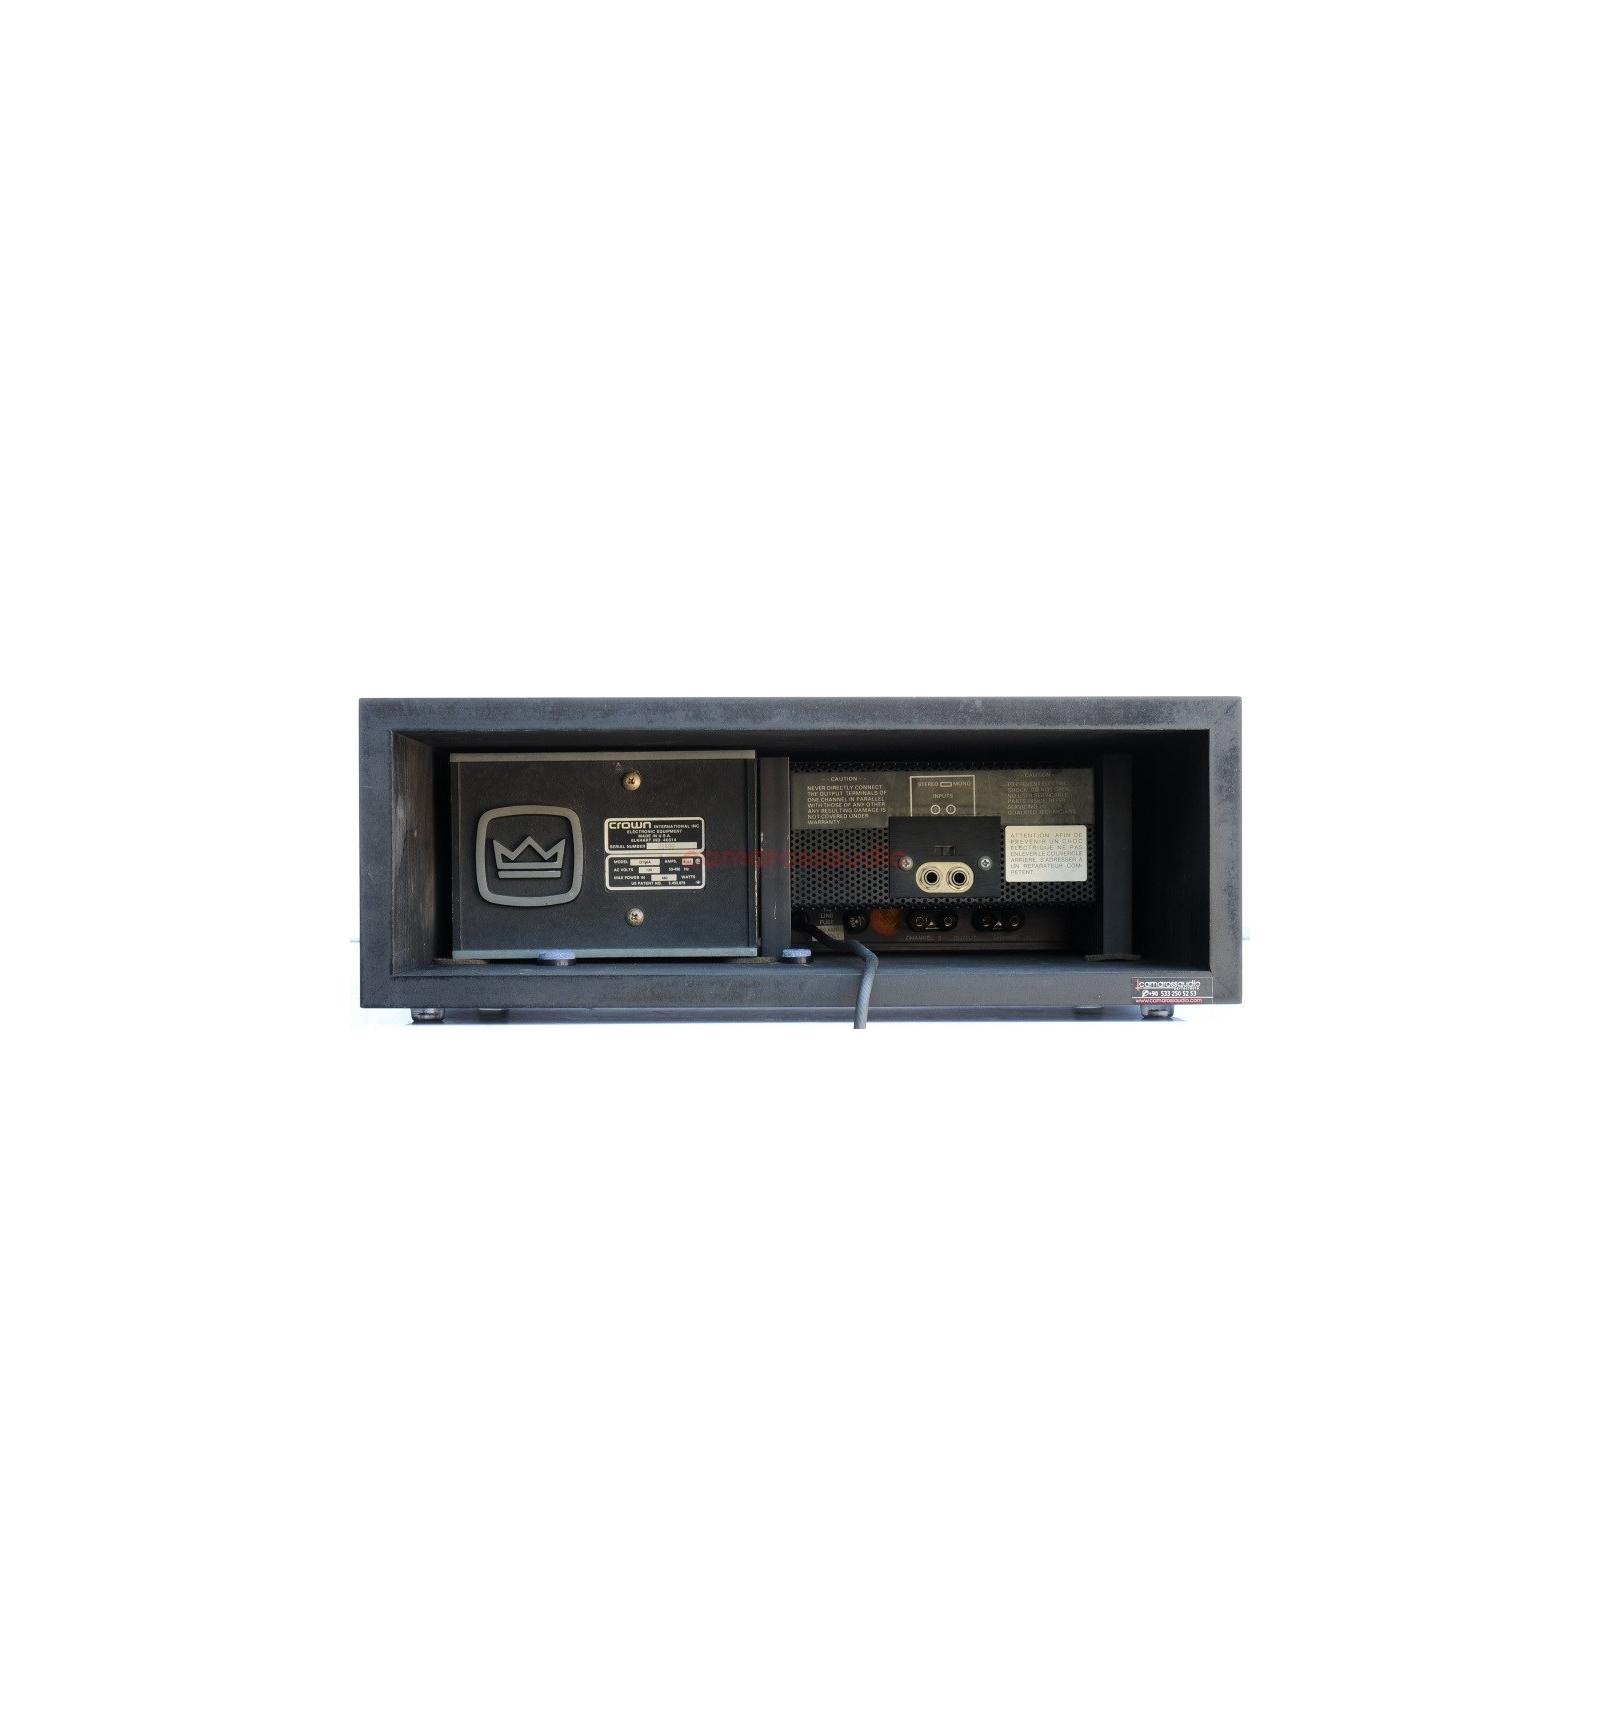 crown d150 a power amplifier camaross audio hifi high detail. Black Bedroom Furniture Sets. Home Design Ideas